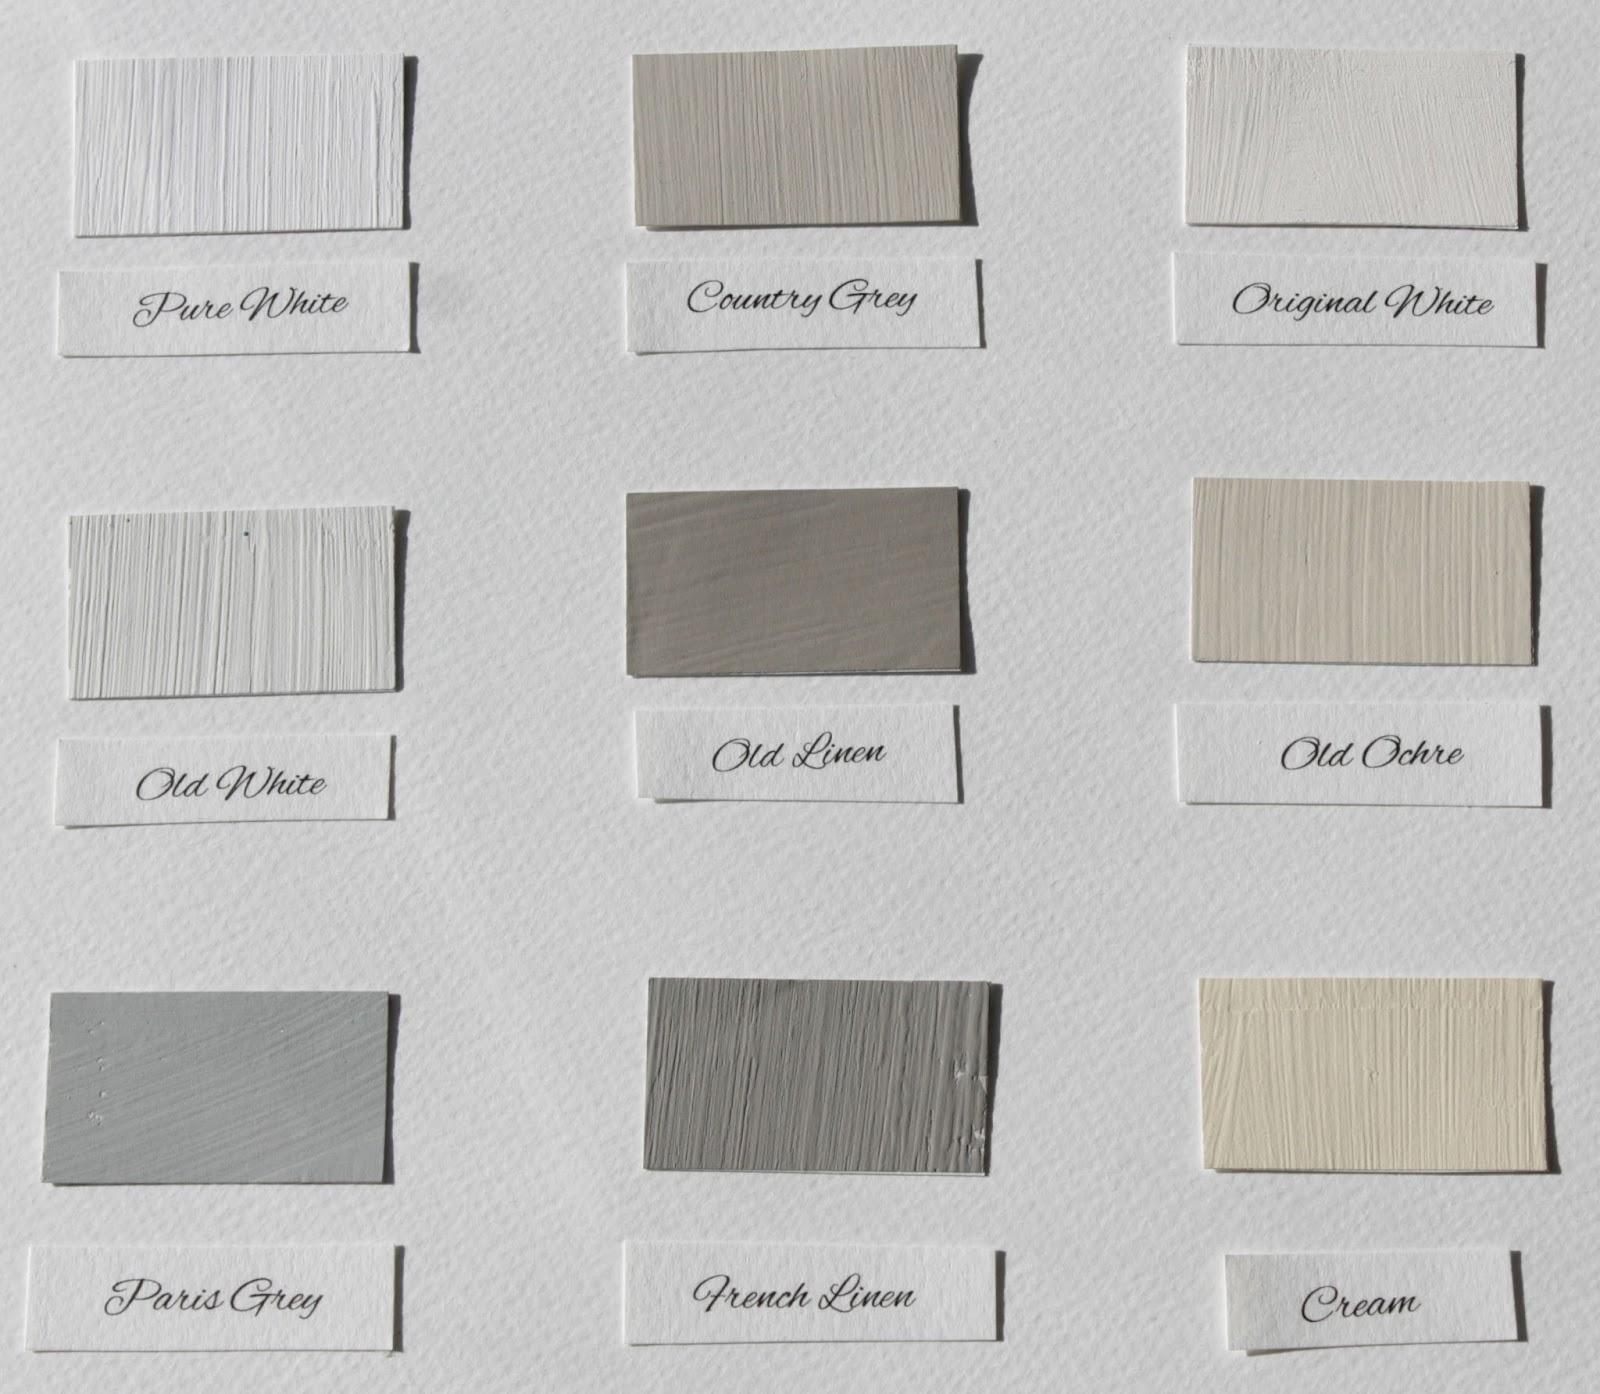 Vernice Chalk Paint Annie Sloan annie sloan italia: i colori chalk paint